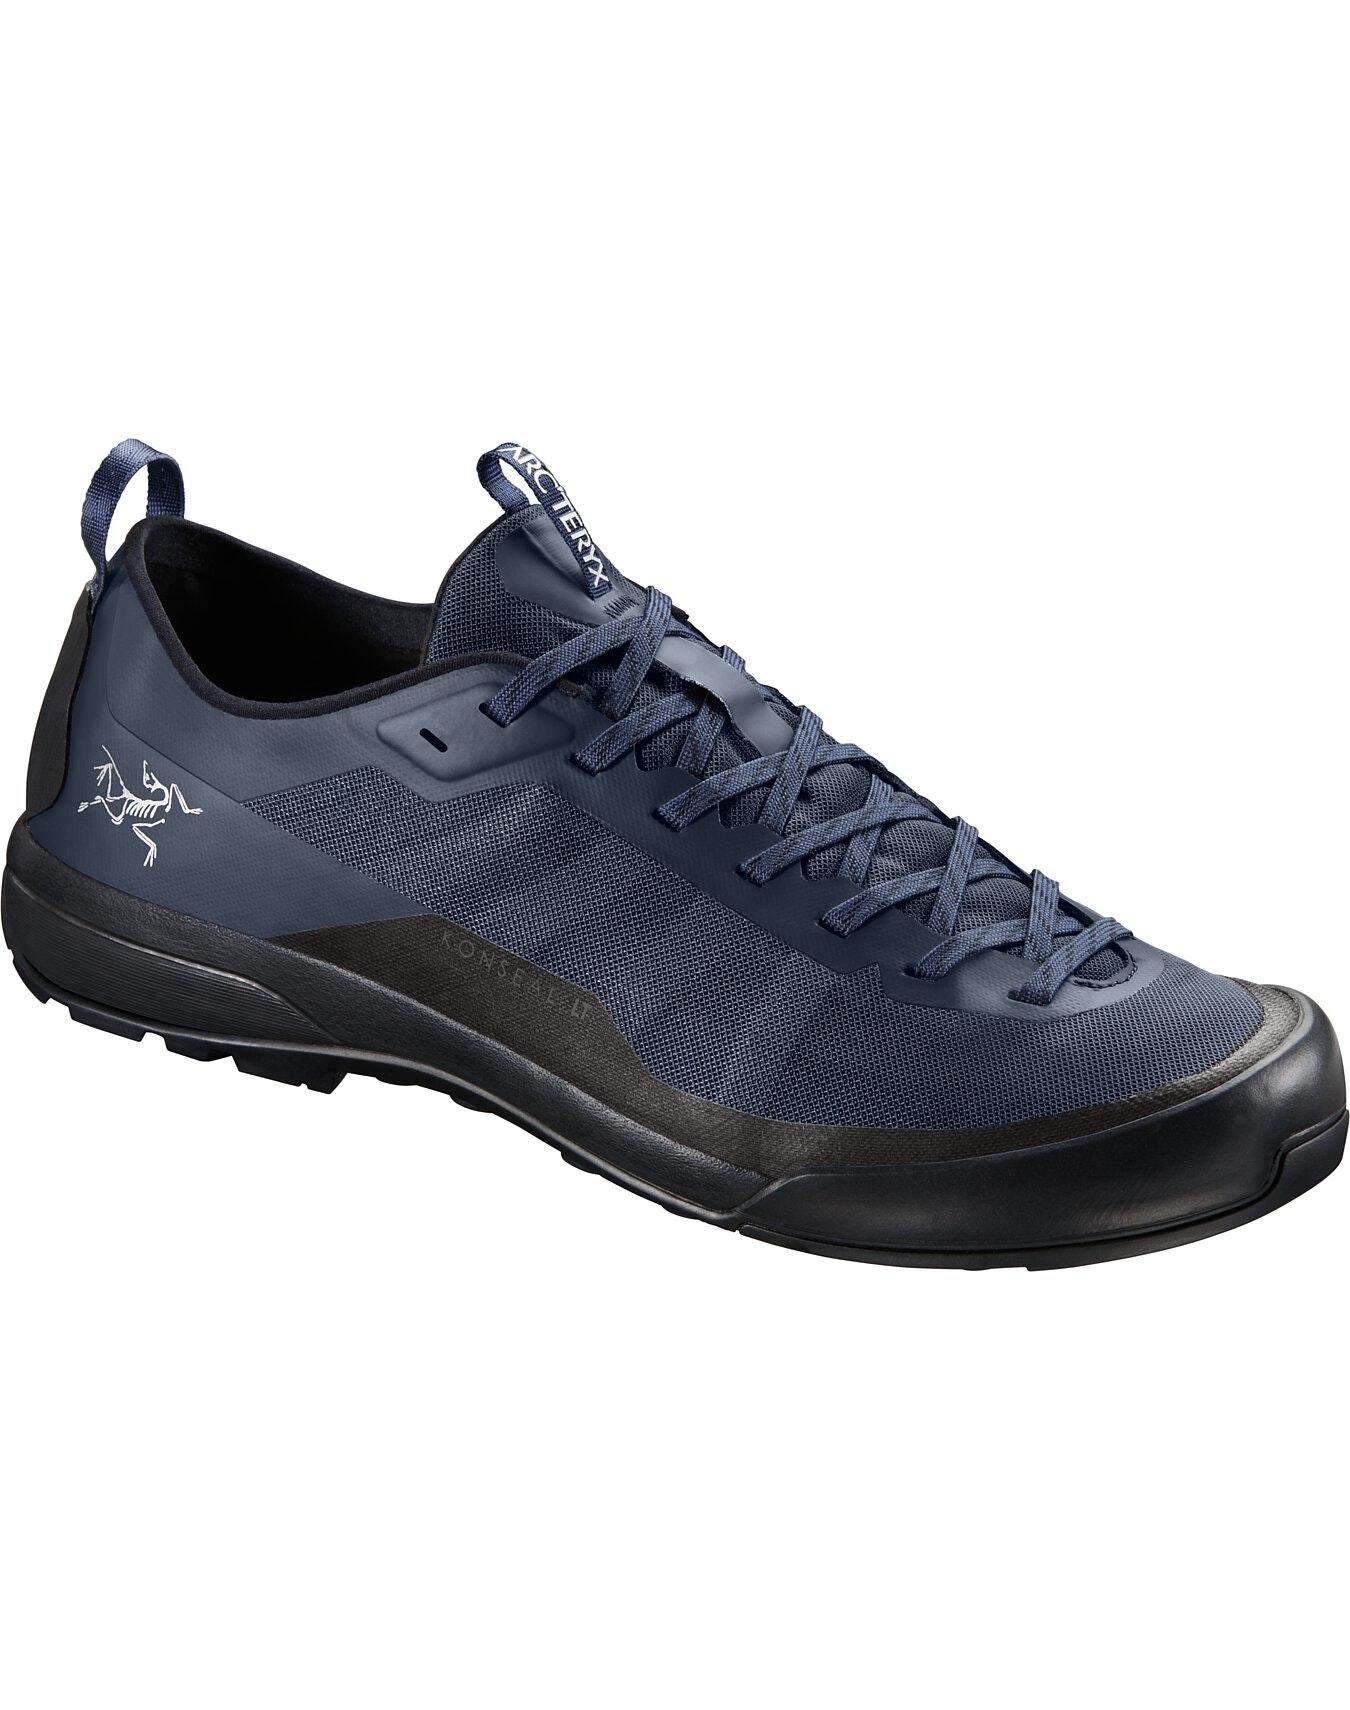 Konseal LT Shoe Exosphere/Black